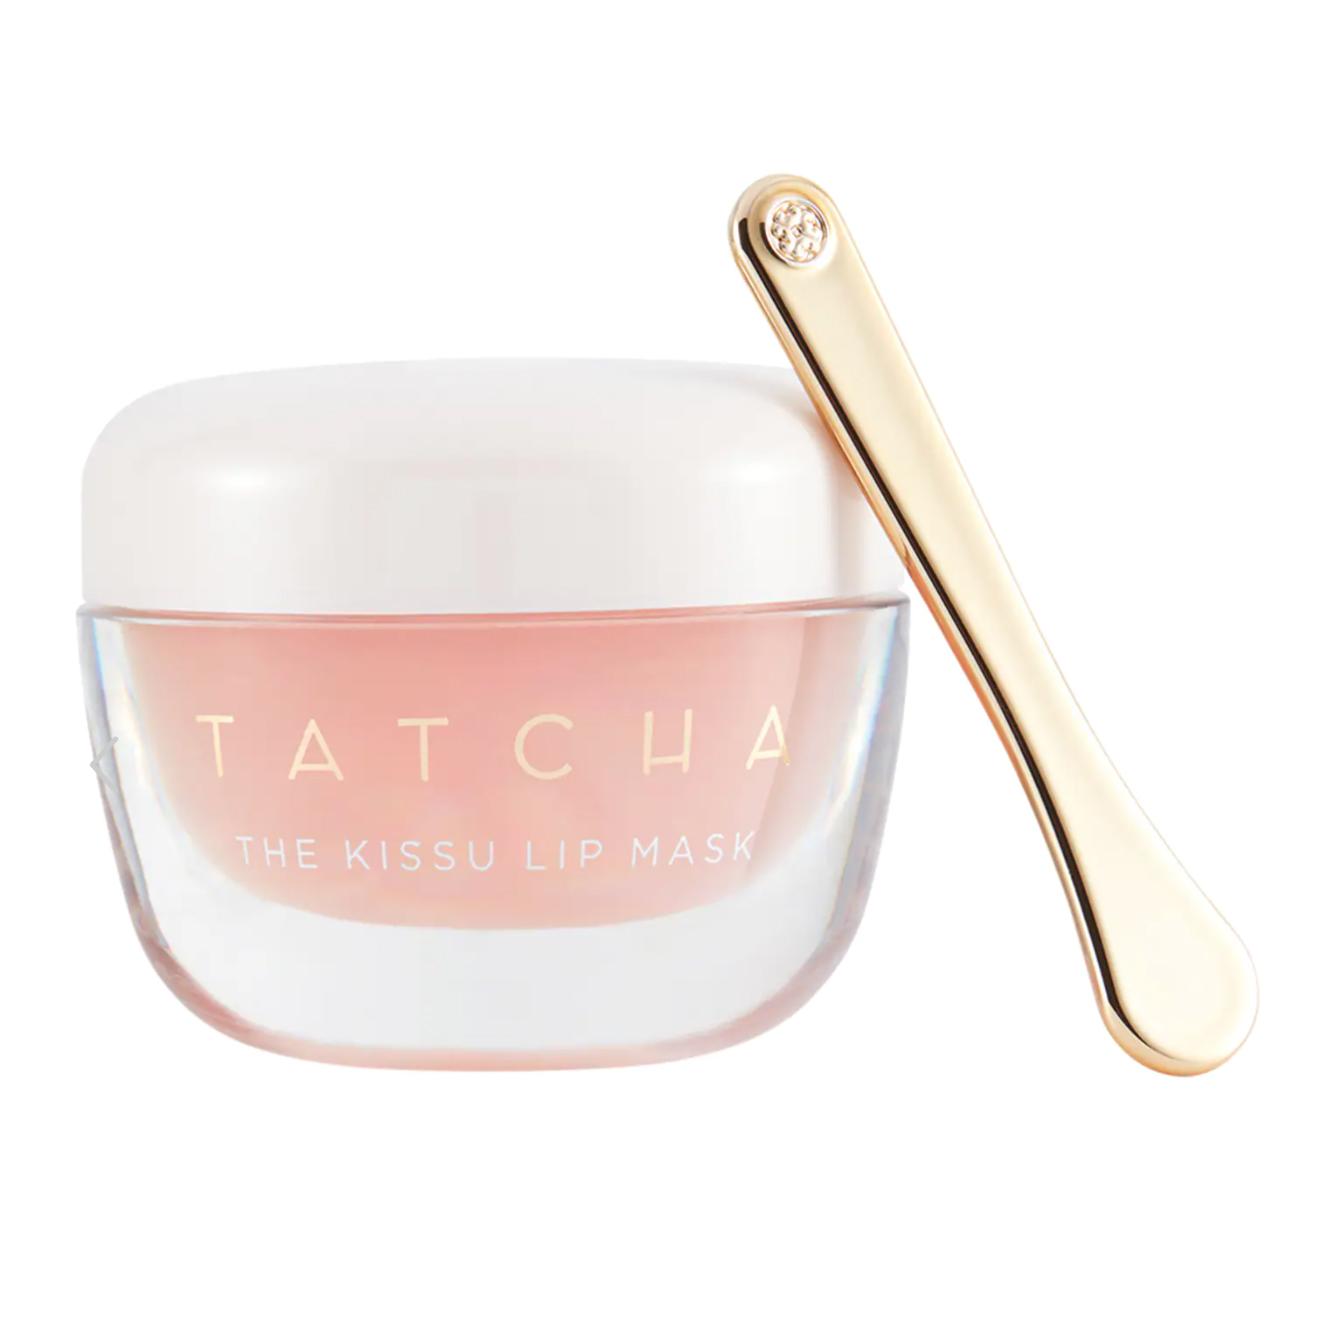 hyram yarbro skincare routine lip balm tatcha